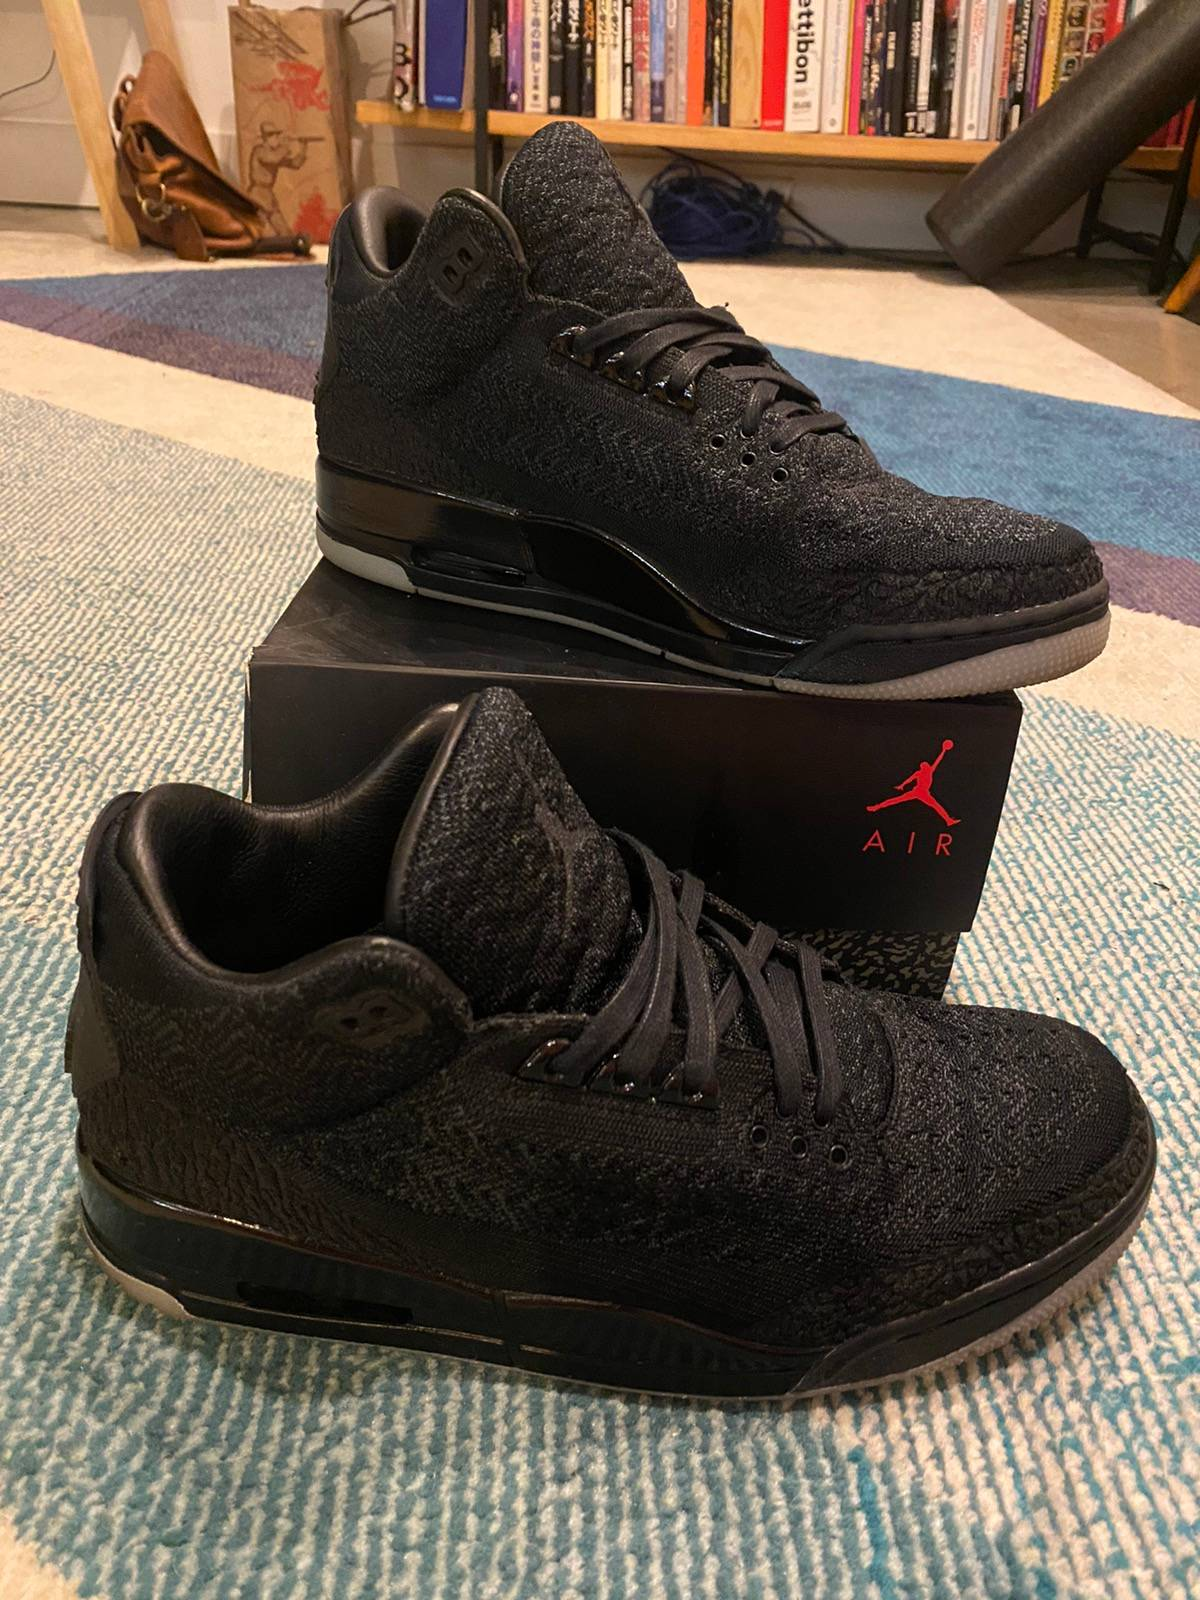 Nike Air Jordan 3 Retro Flyknit Black 2018